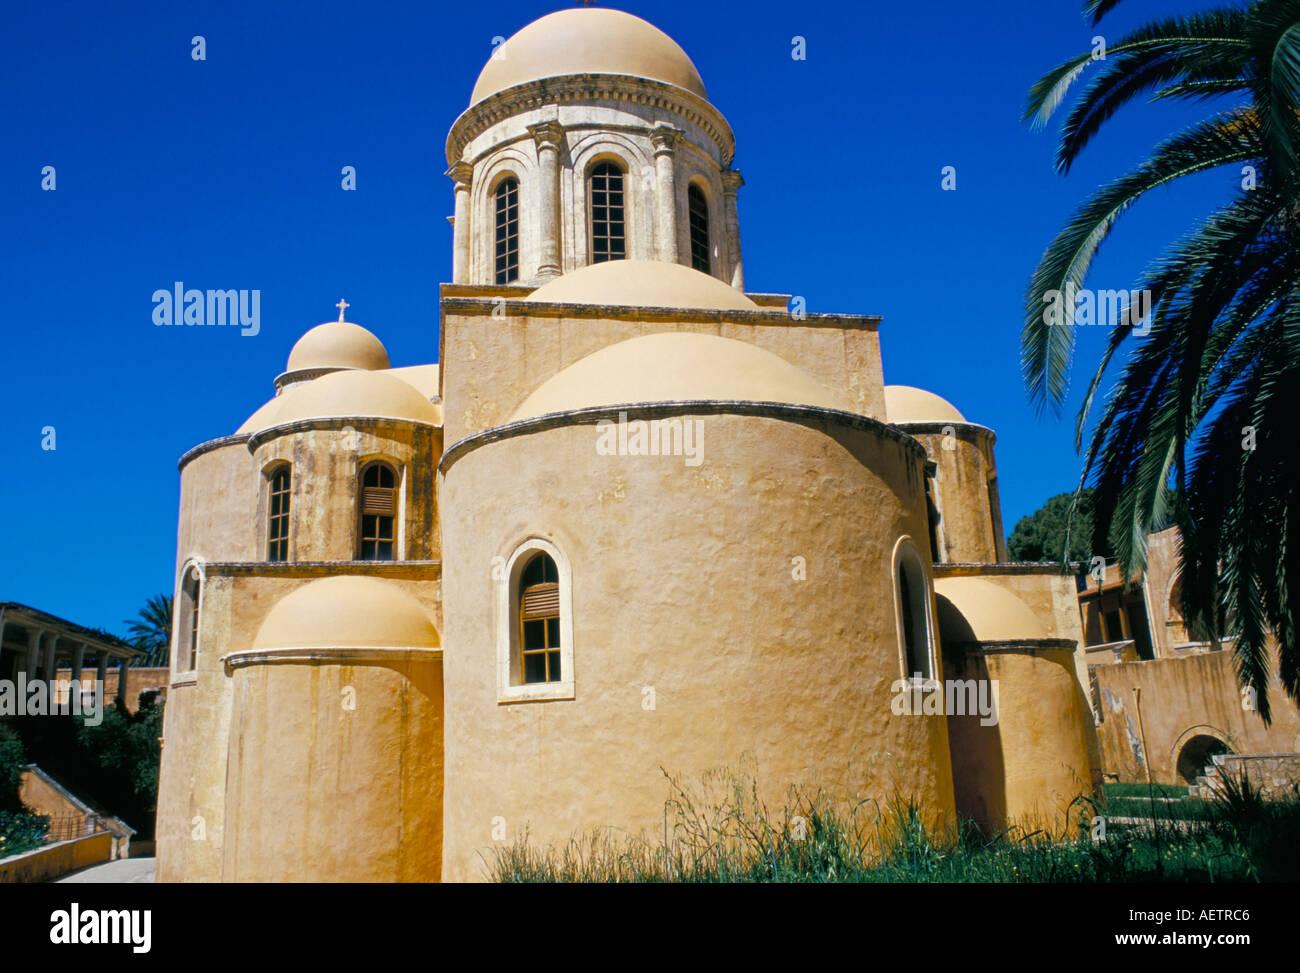 The 17th century Venetian built Christian monastery of Agias Triada Akrotiri peninsula island of Crete Greece Mediterranean Euro - Stock Image